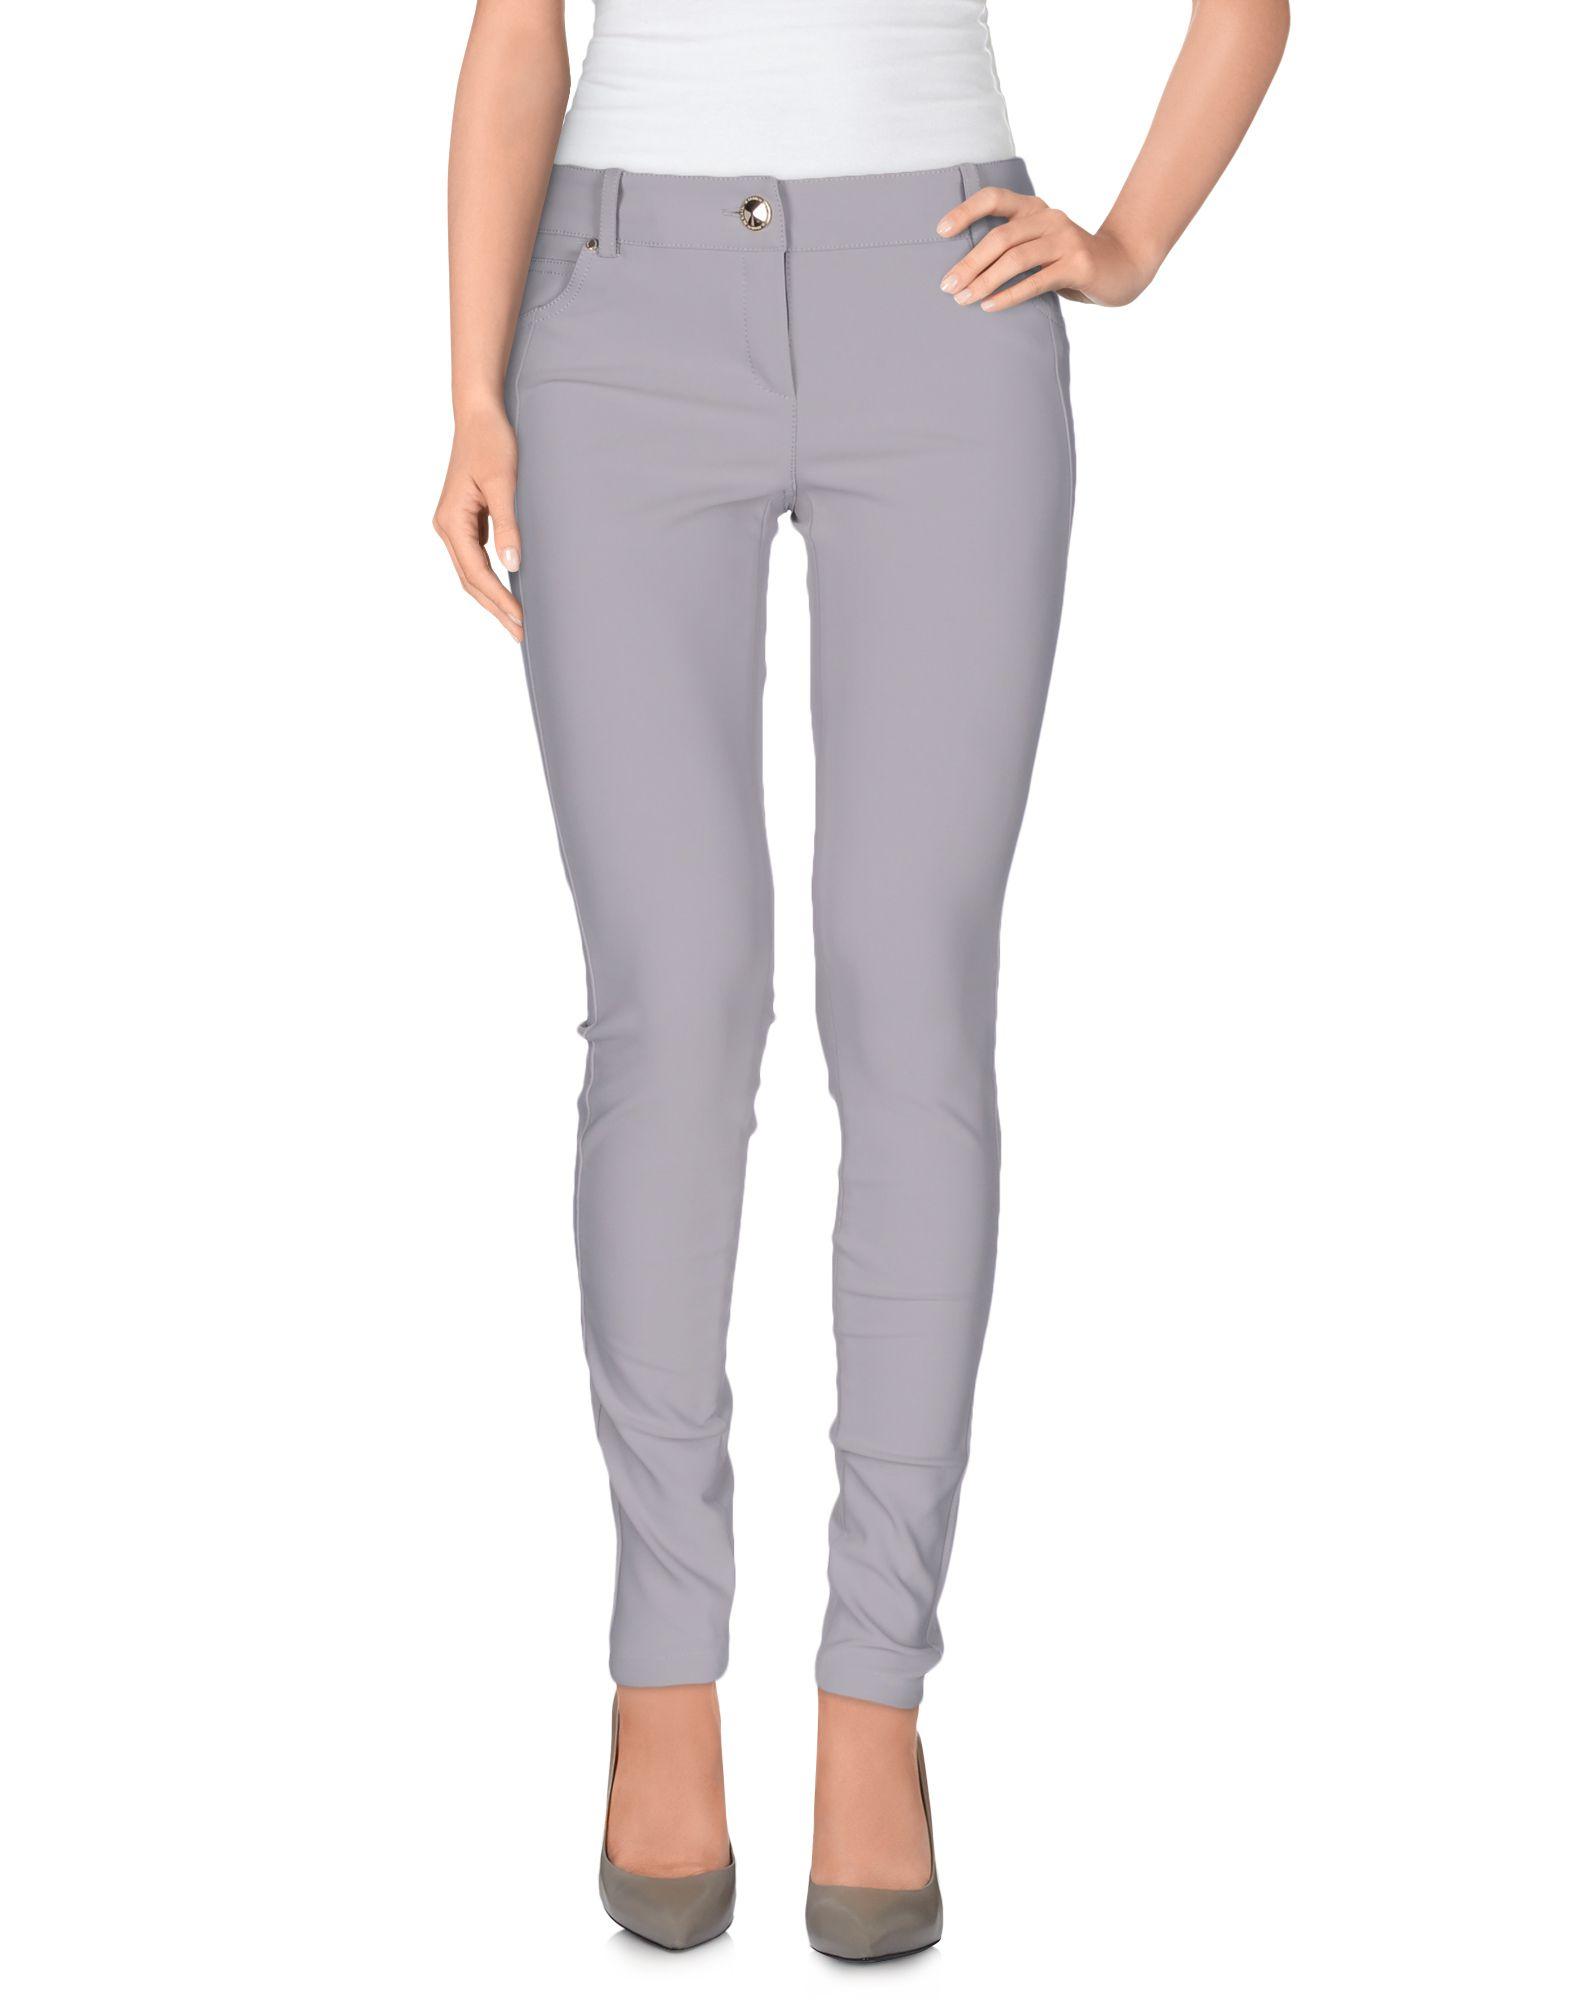 Pantalone Elisabetta Franchi Donna - Acquista online su CcE2Aioov